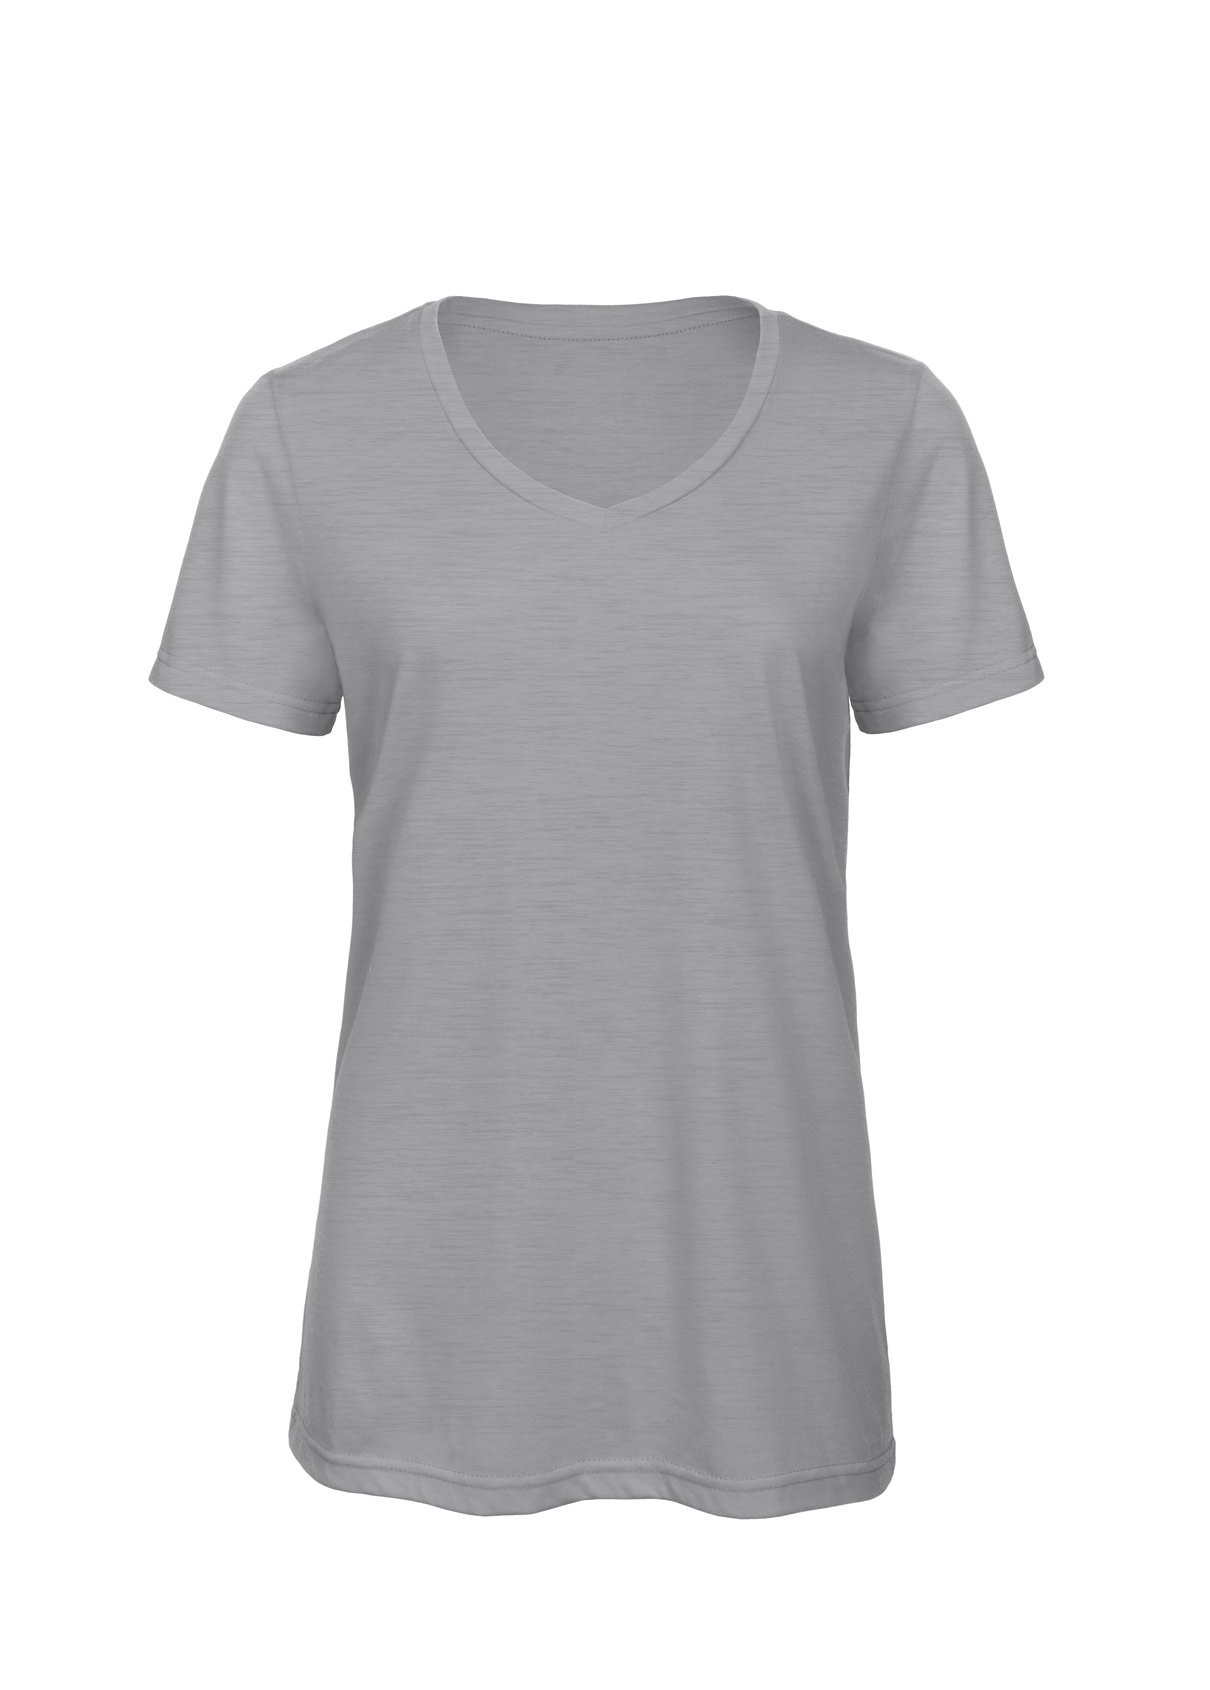 T-shirt γυναικείο No 058 - Γκρι (TW058)